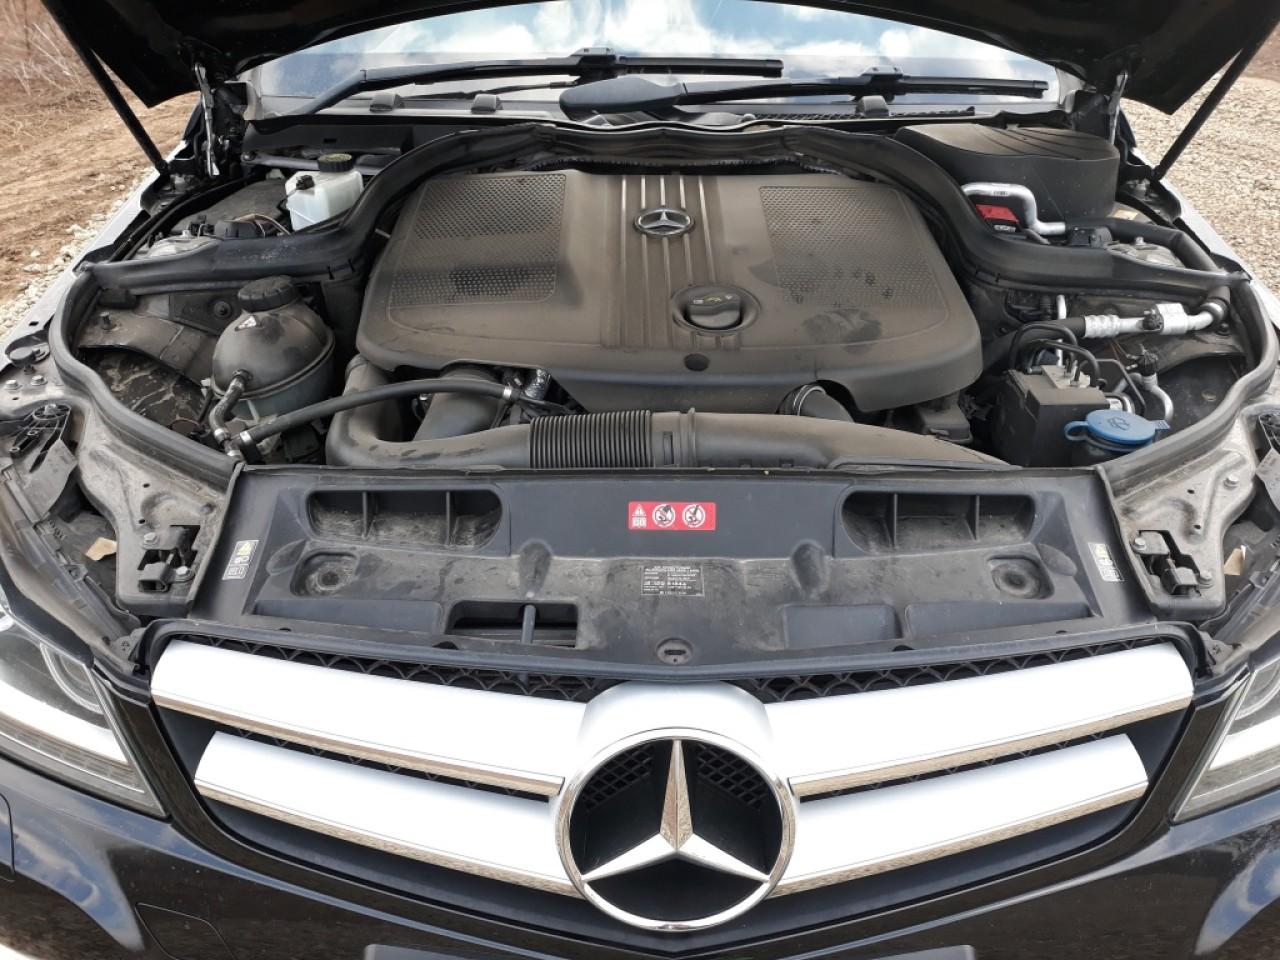 Cotiera Mercedes C-CLASS W204 2013 coupe 2.2